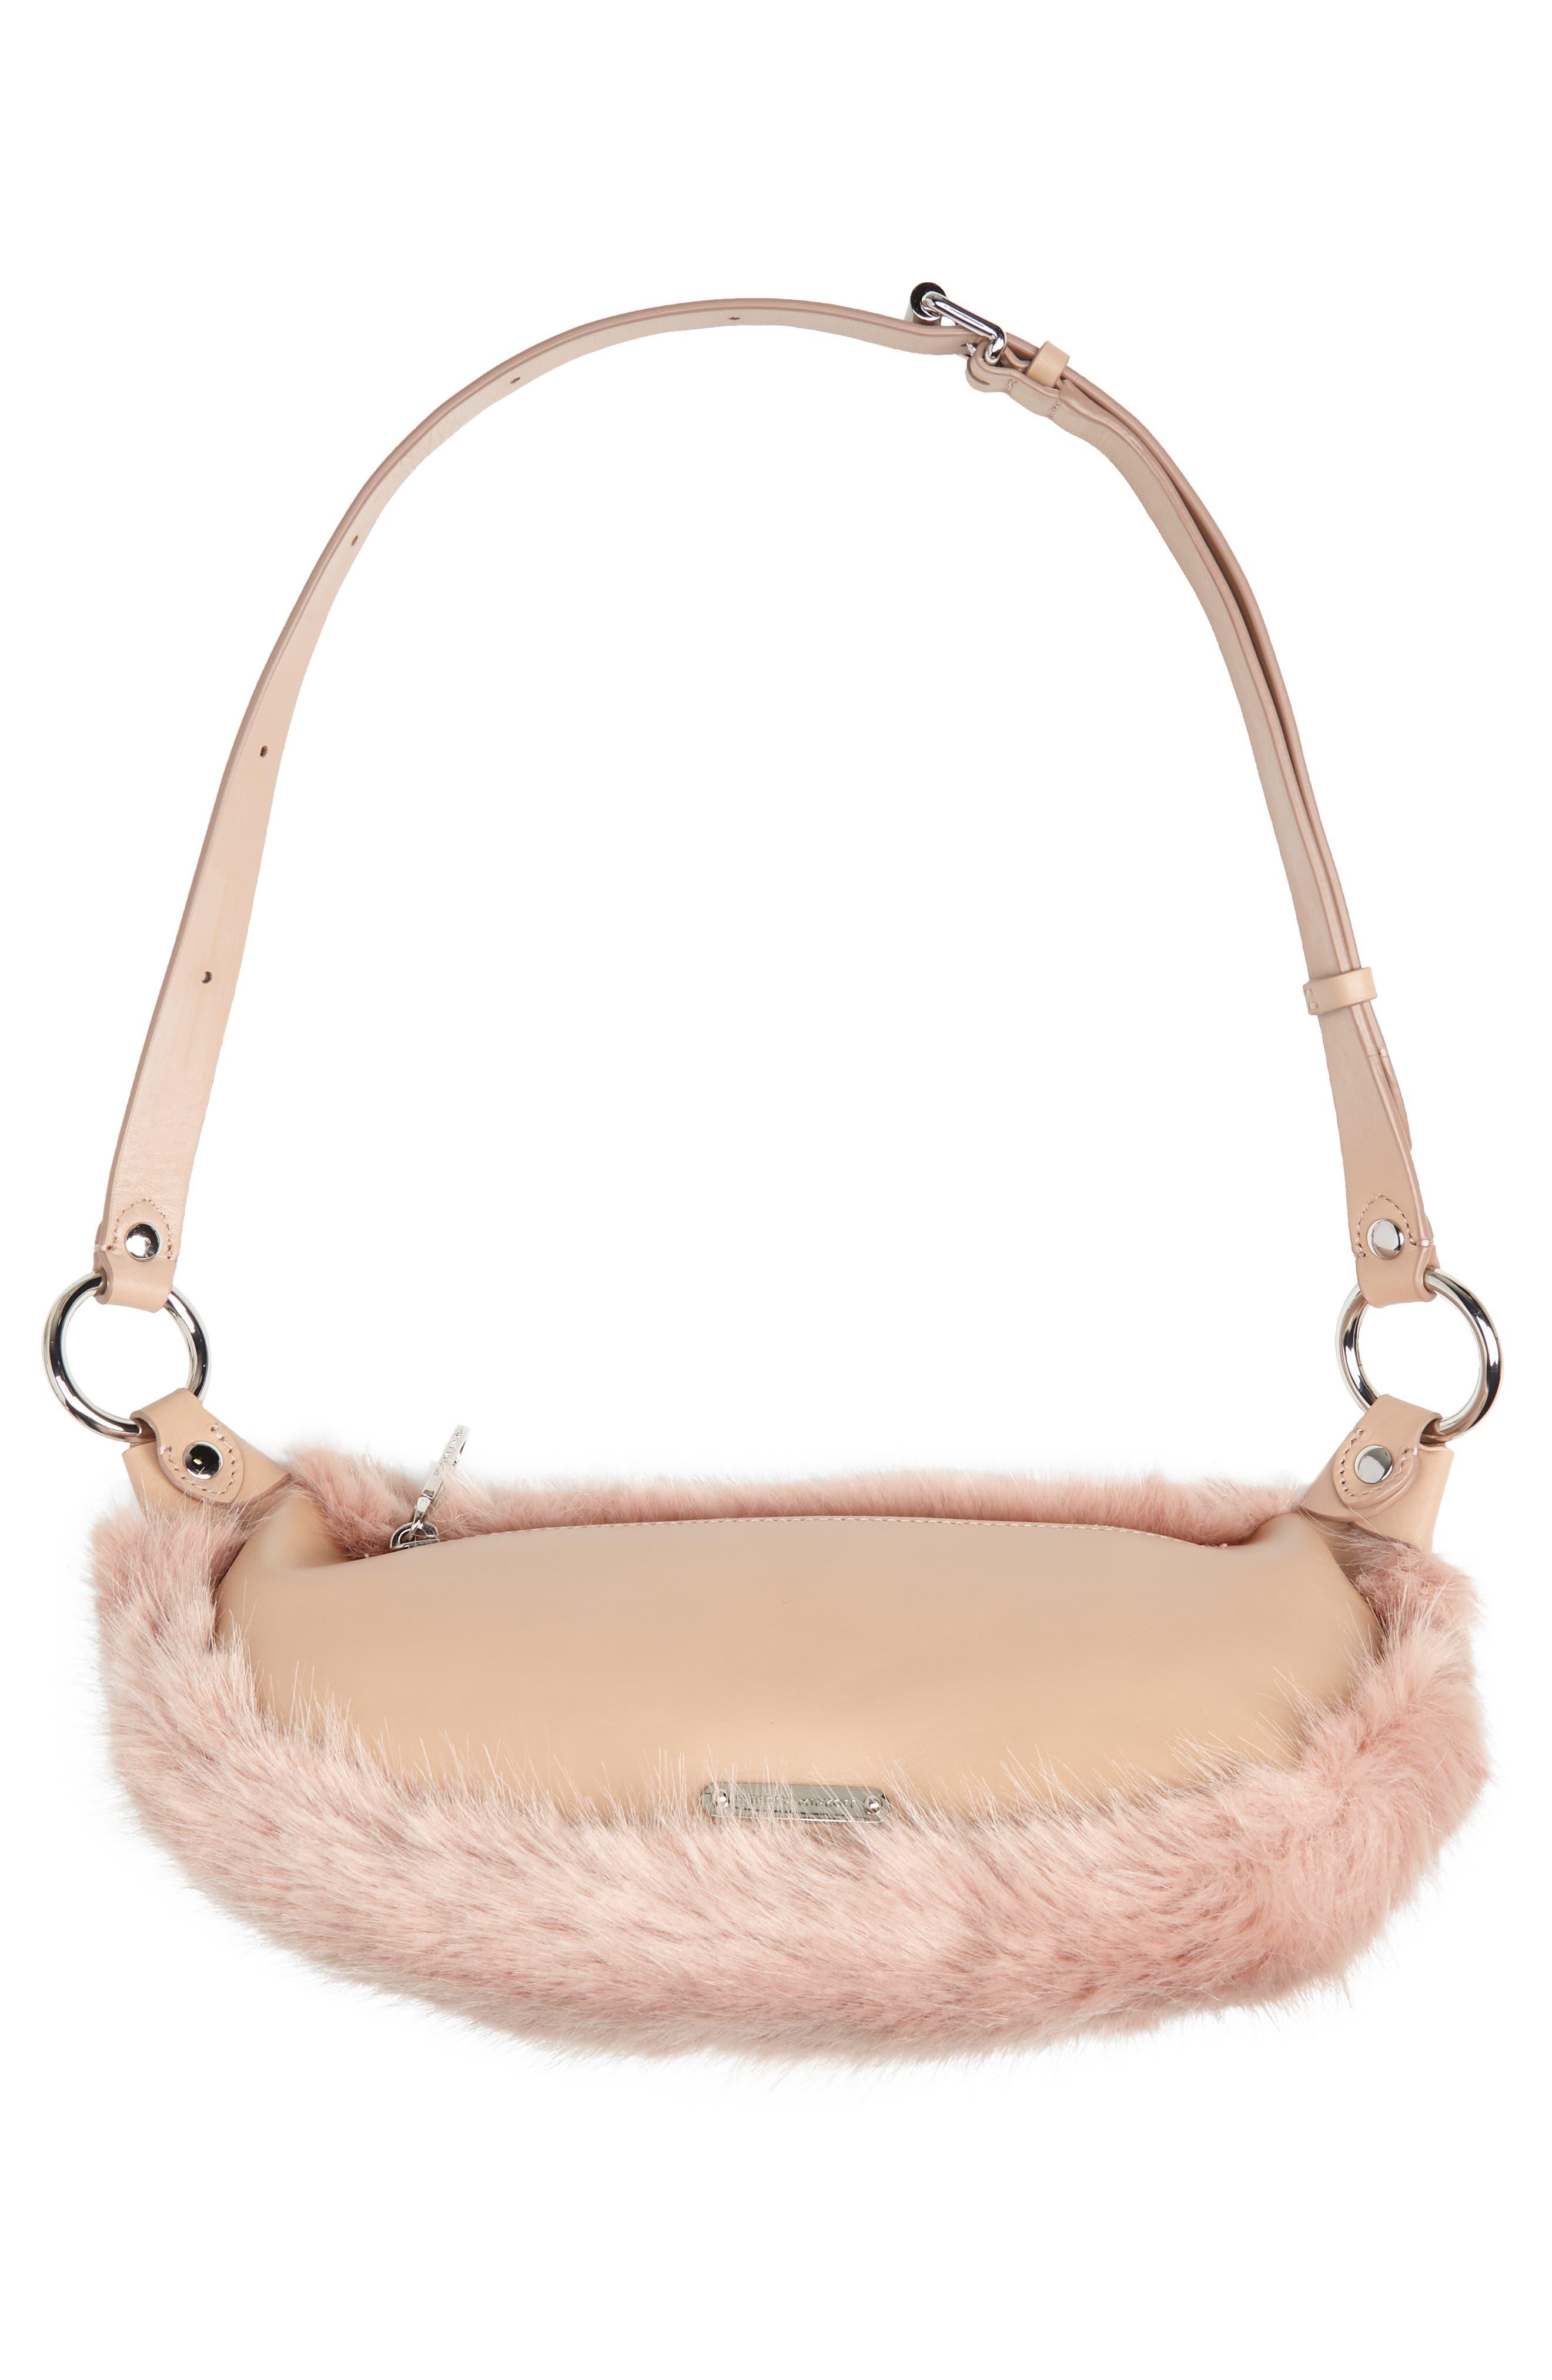 REBECCA MINKOFF,                             Faux Fur Belt Bag,                             Alternate thumbnail 7, color,                             250